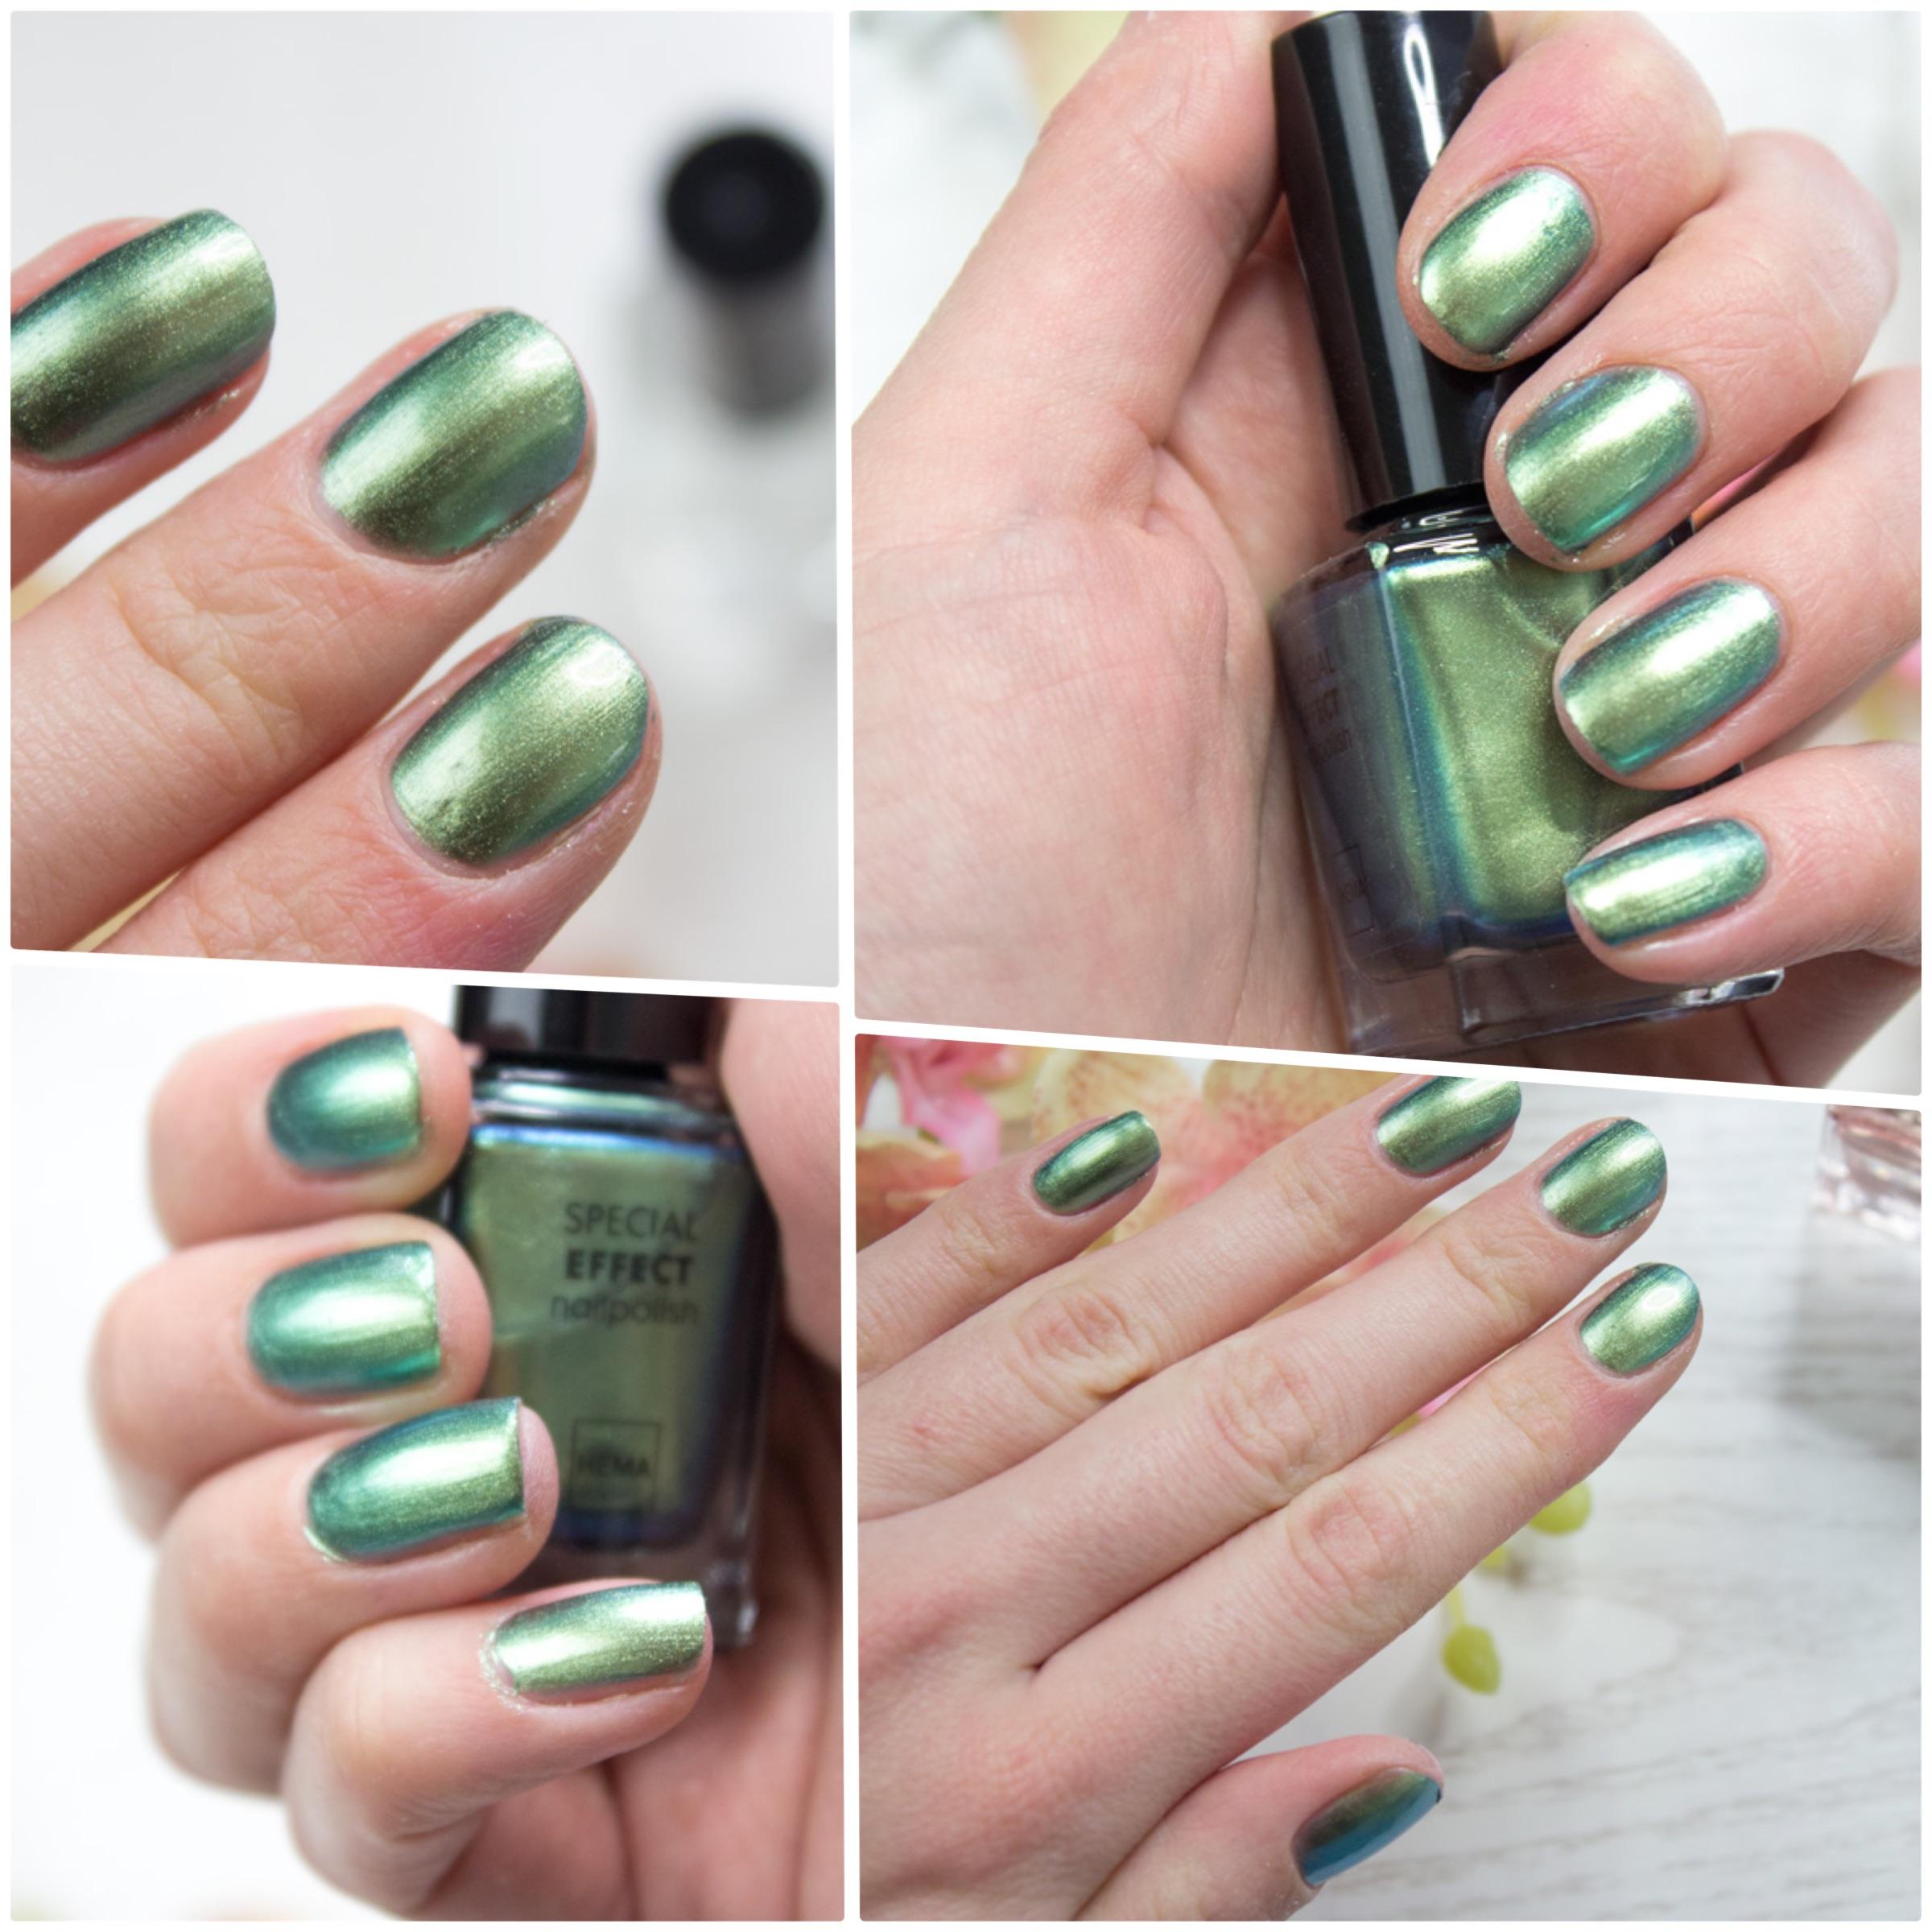 Hema Special effect Nailpolish 66 // Chameleon